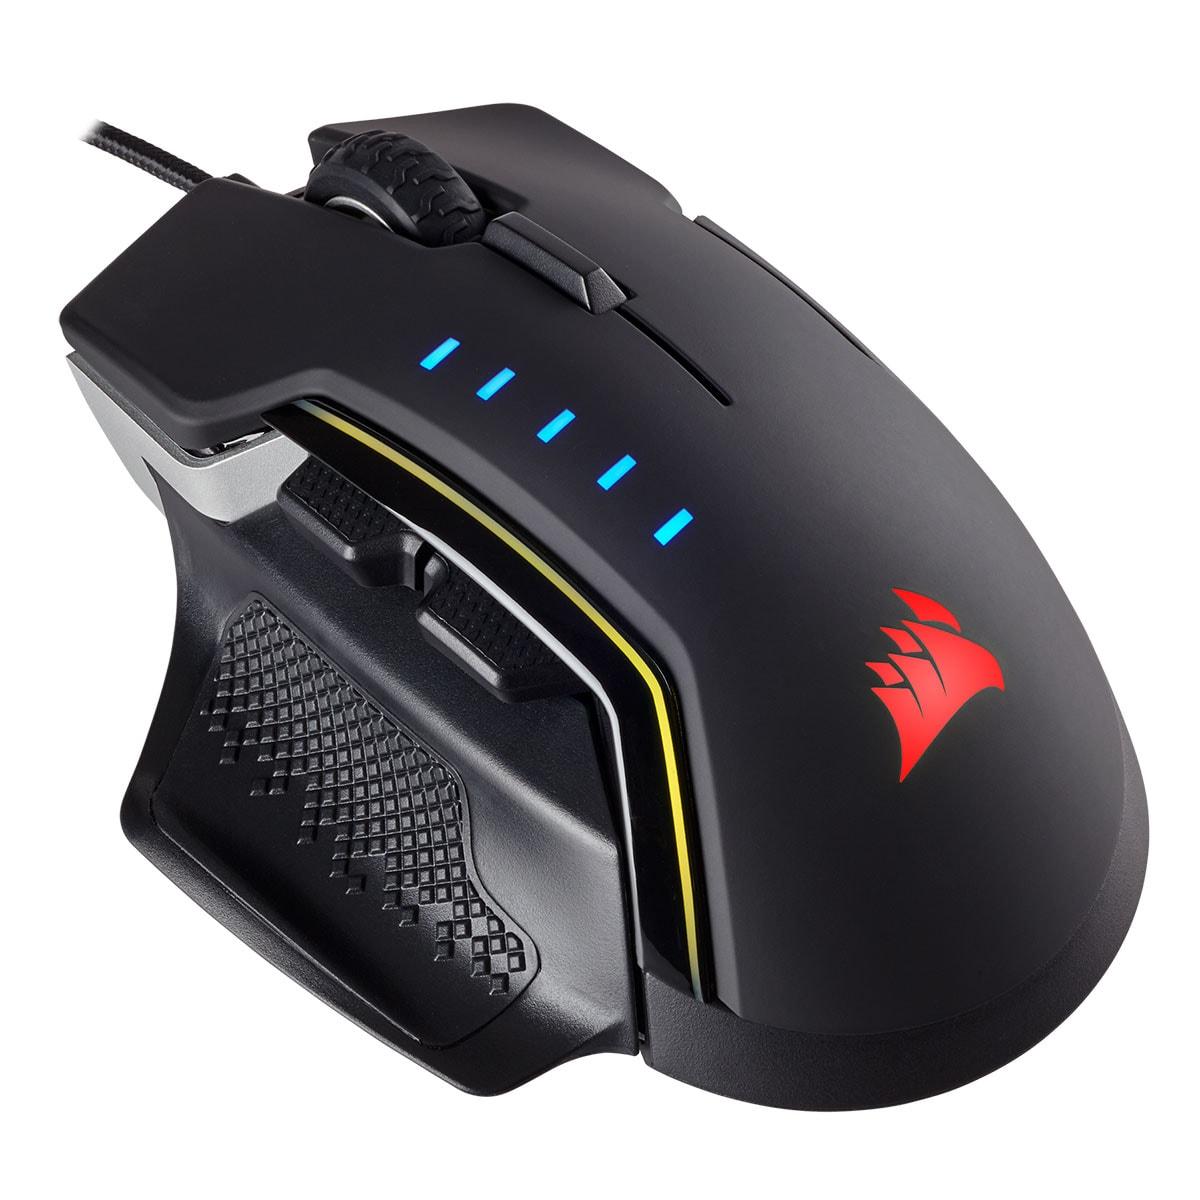 Corsair Glaive RGB Gaming Mouse Aluminium - Souris PC Corsair - 4